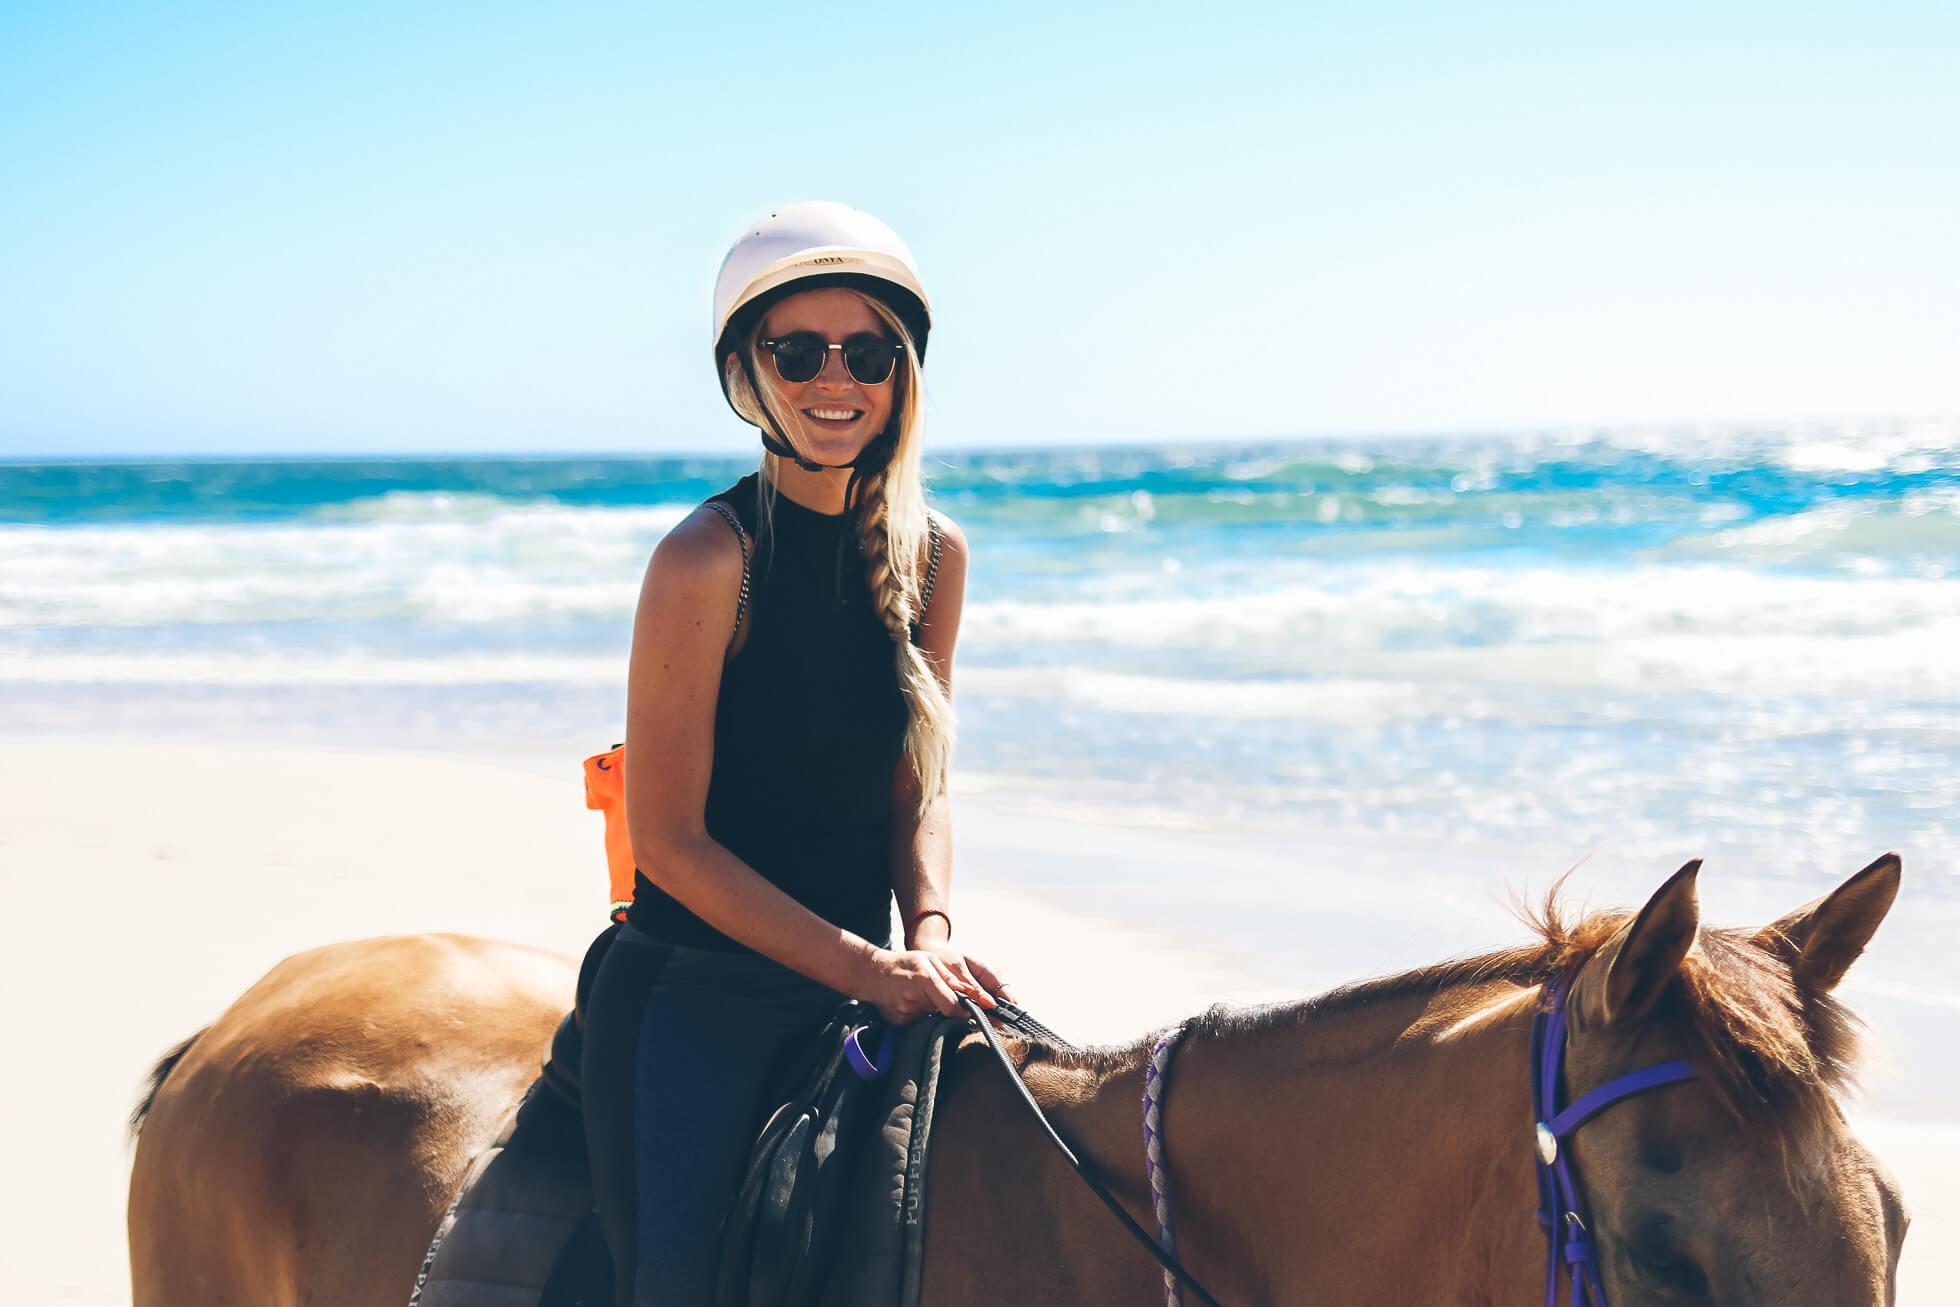 janni-deler-horseback-riding-byronbayIMG_1473